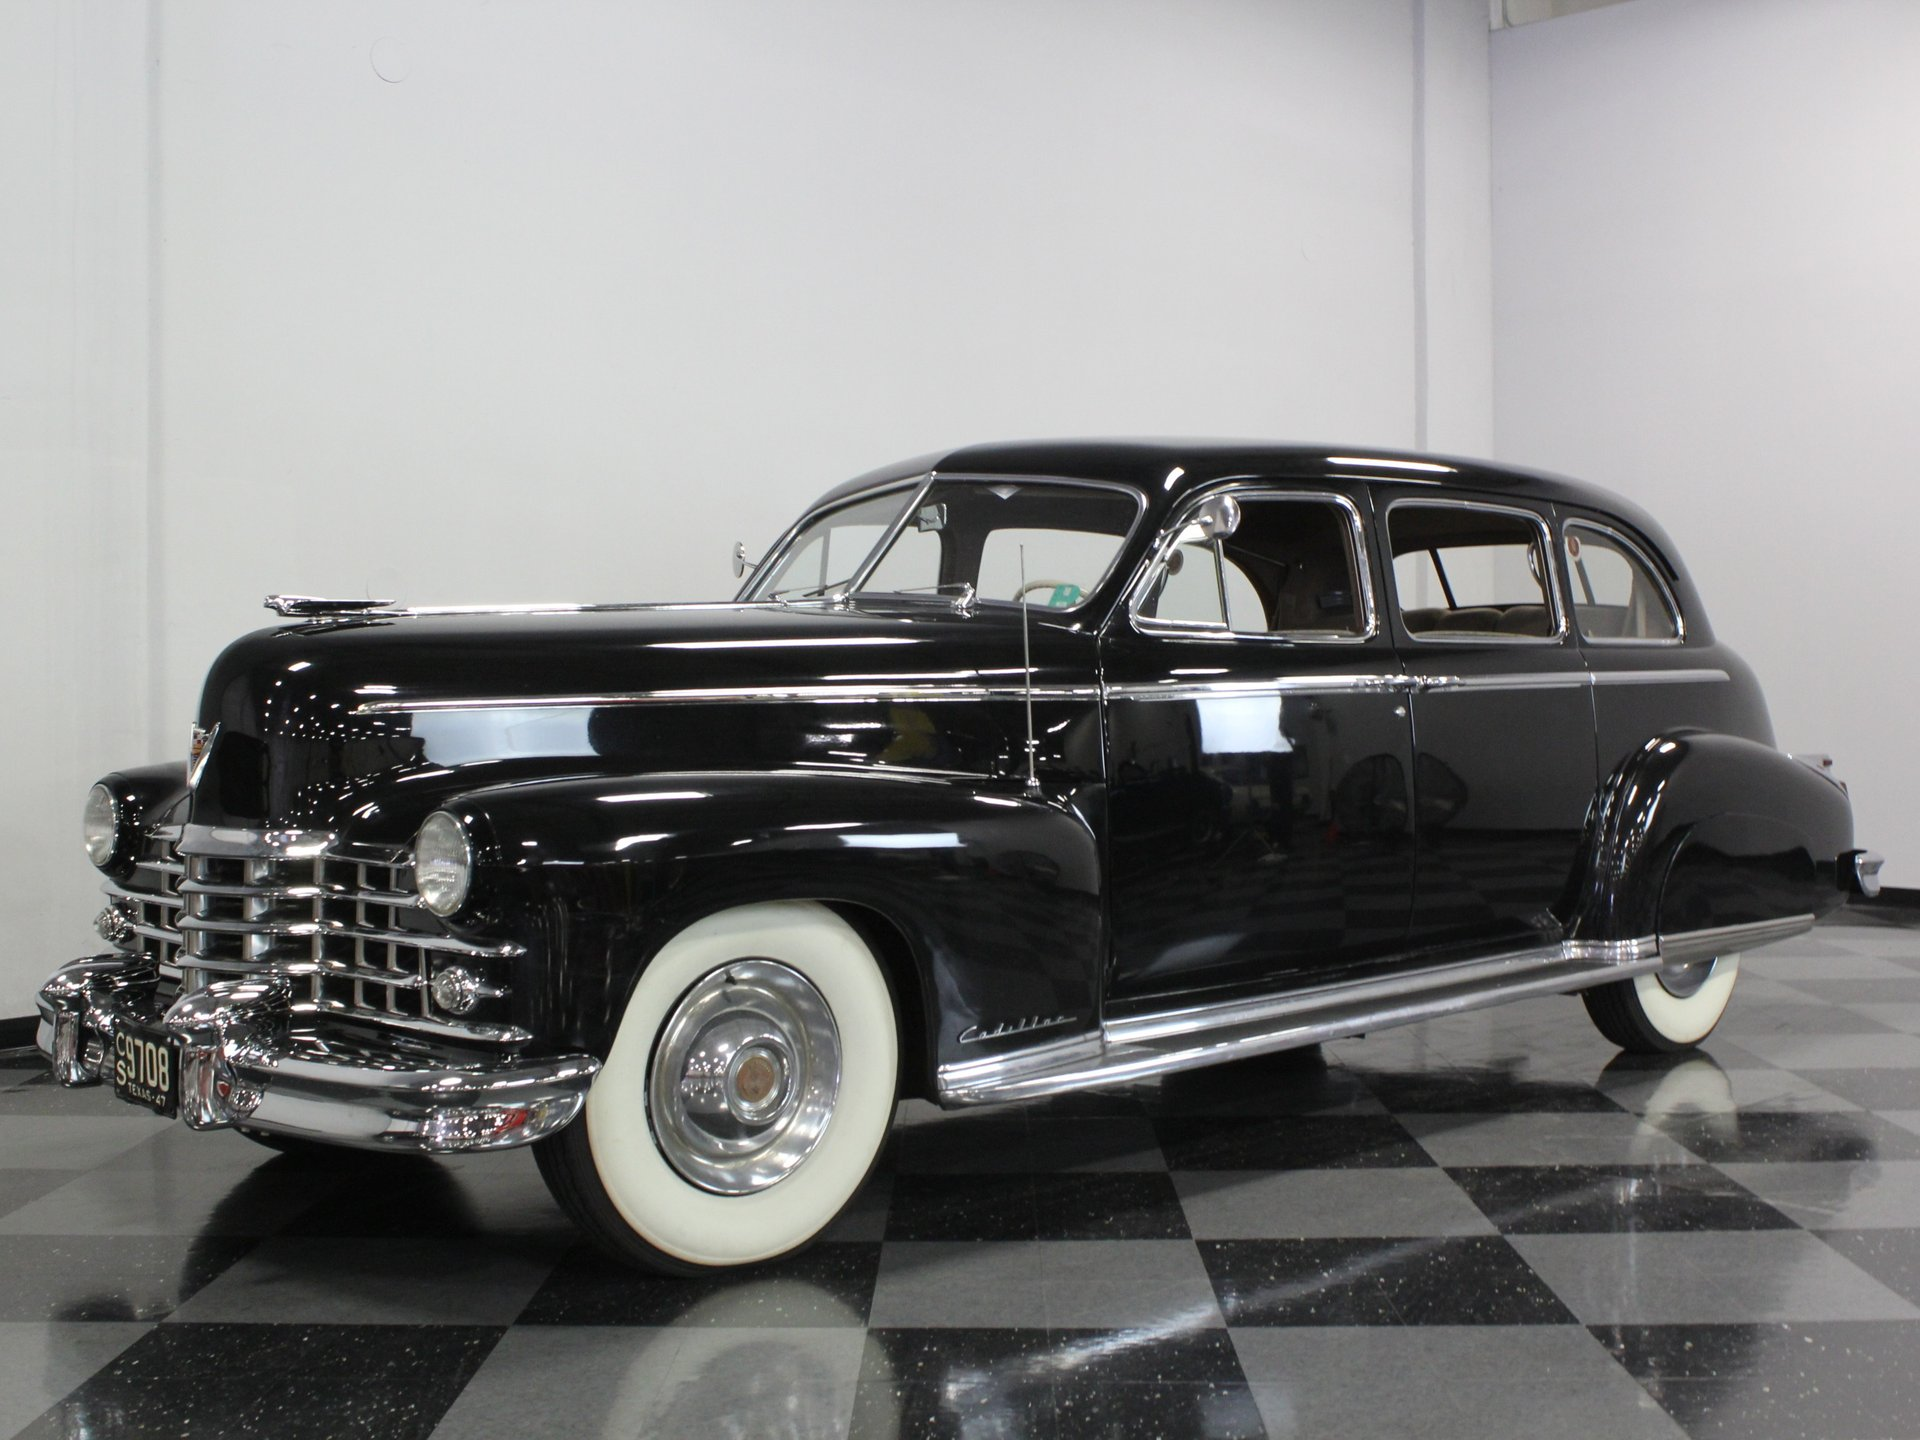 1947 cadillac fleetwood limousine